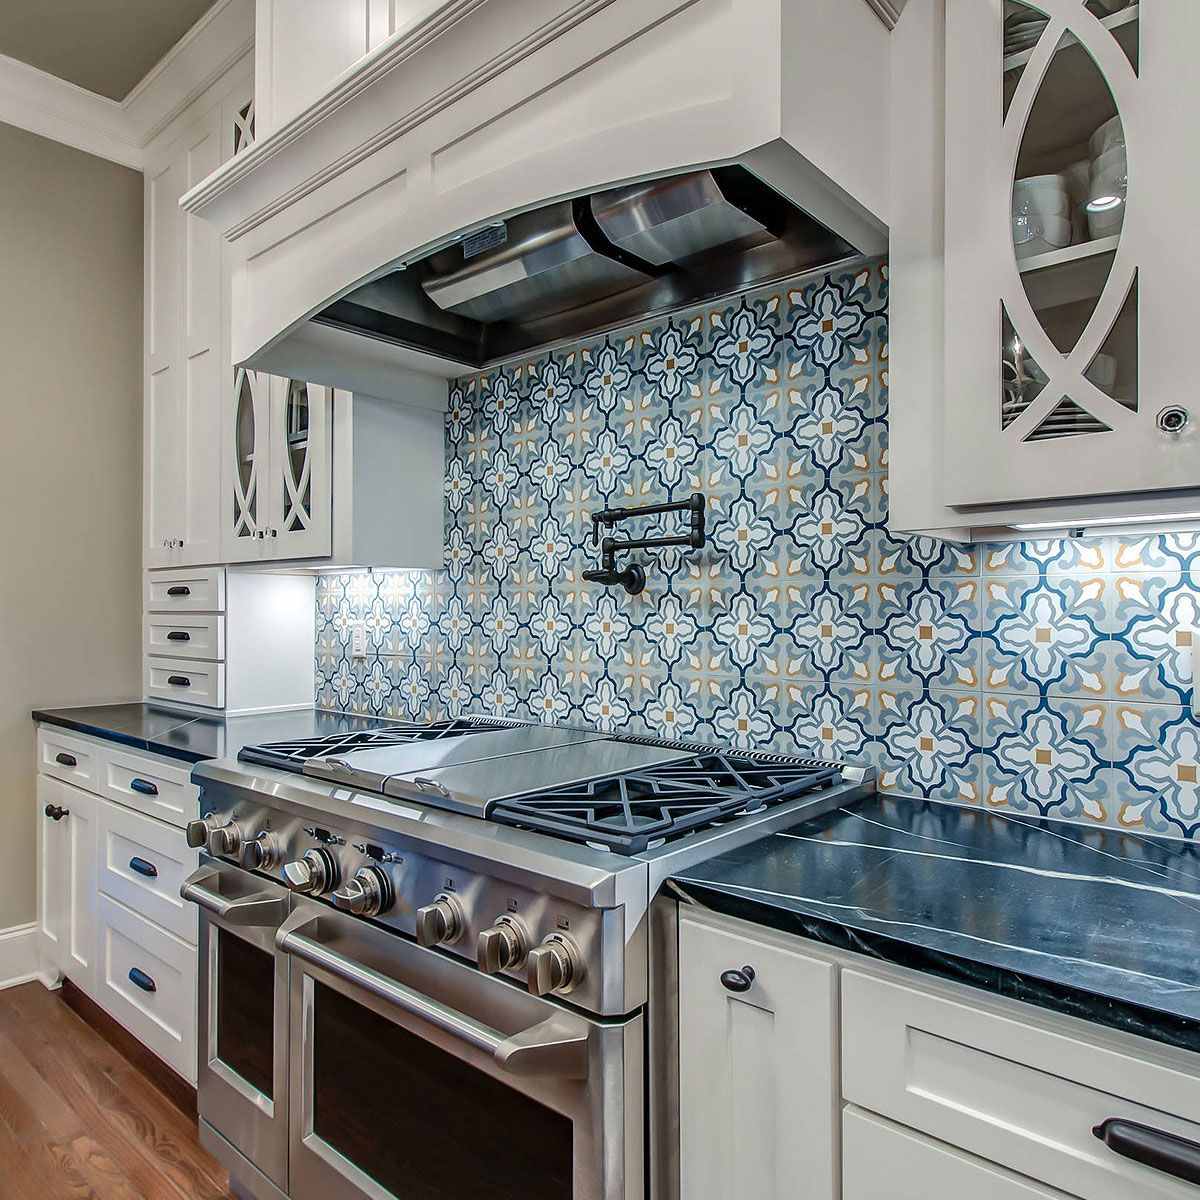 75 Blue Backsplash Ideas Navy Aqua Royal Or Coastal Blue Design Blue Backsplash Blue Kitchen Tiles White Tile Backsplash